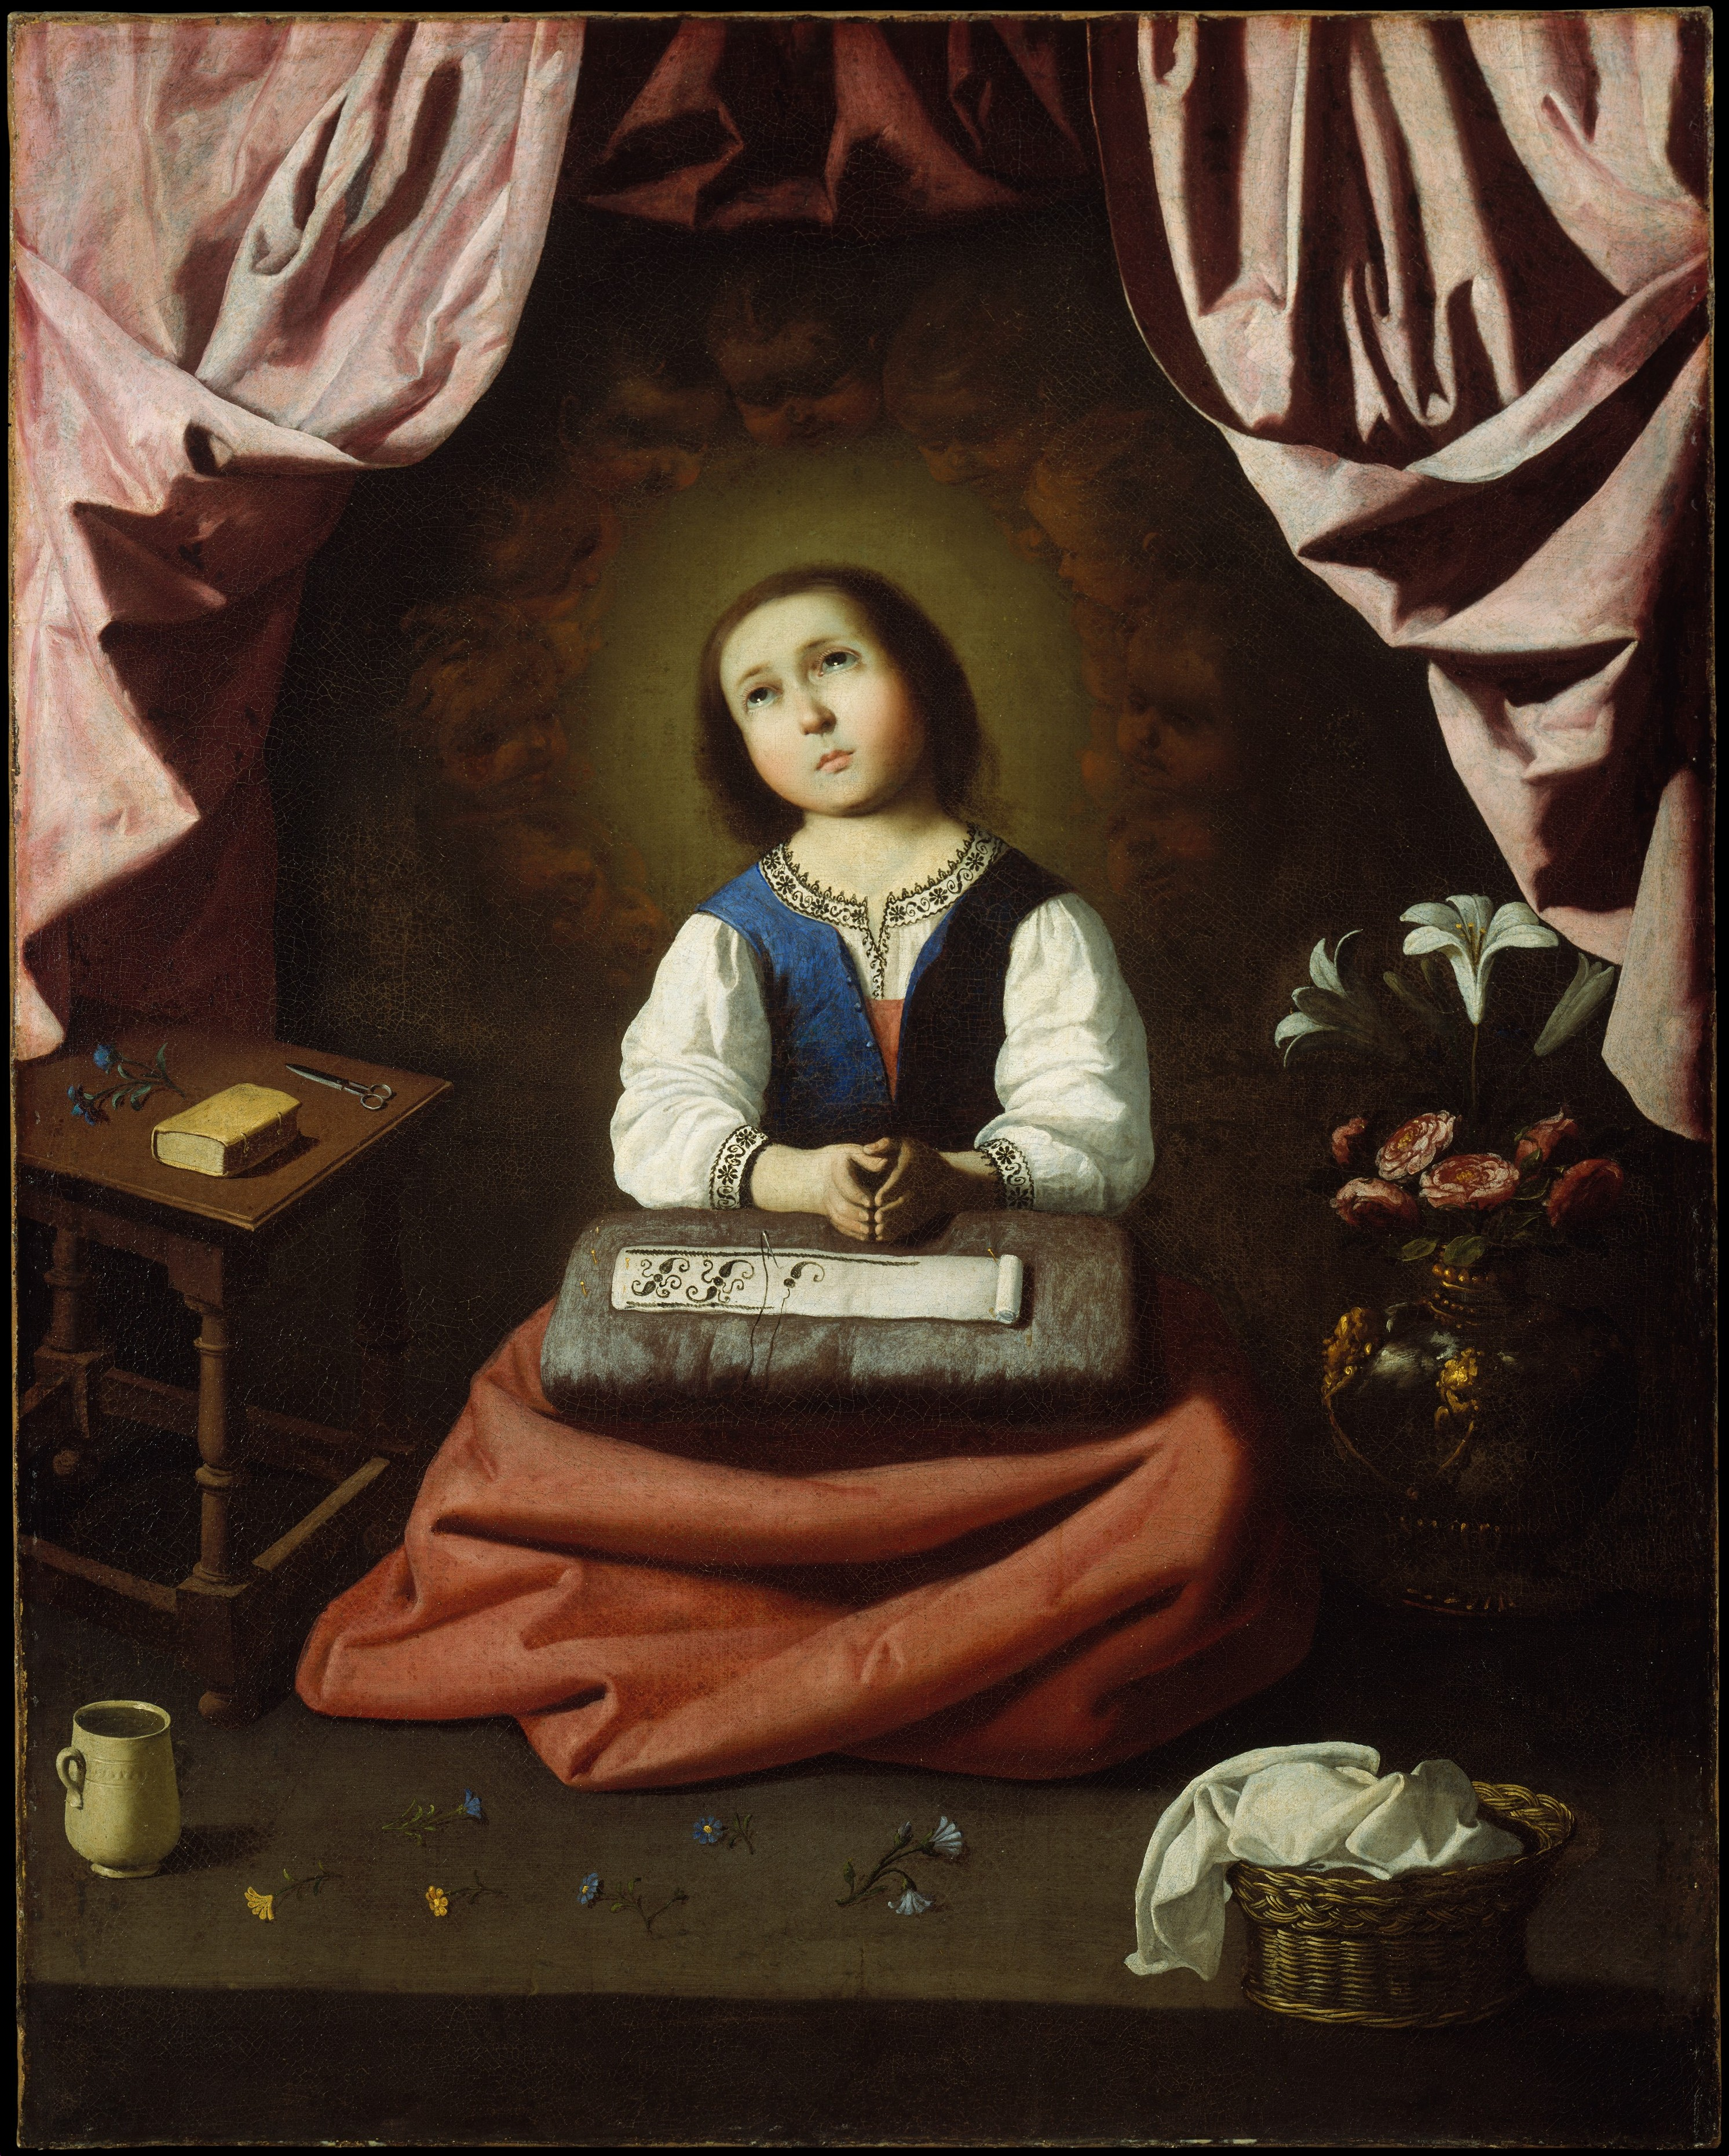 The Young Virgin, by Francisco de Zurbarán, c, 1632-33, The Metropolitan Museum of Art, New York, New York, United States. Via IllustratedPrayer.com